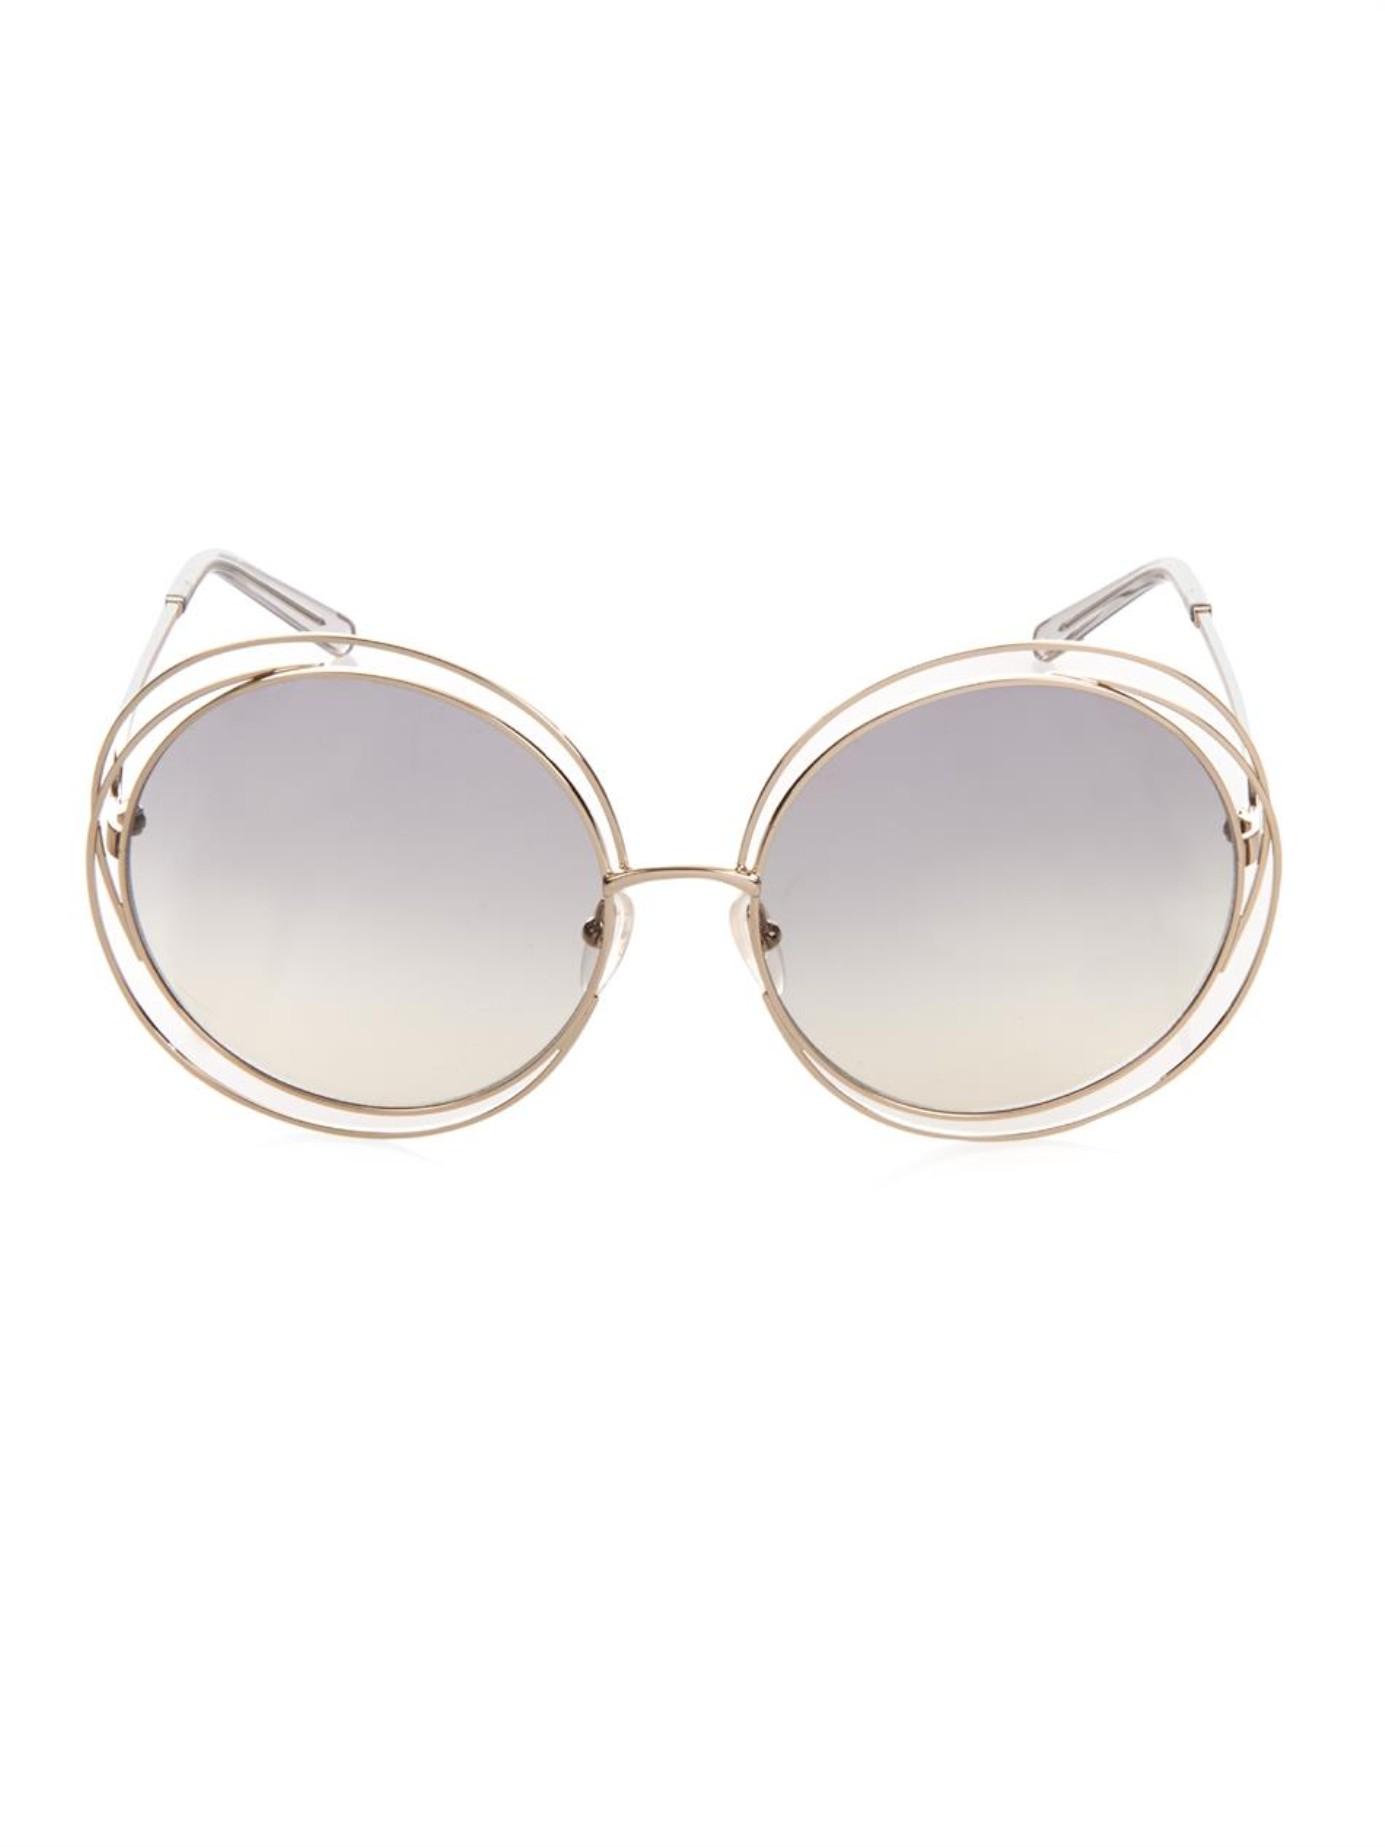 7e874b8de11 Lyst - Chloé Carlina Round-Framed Sunglasses in Metallic